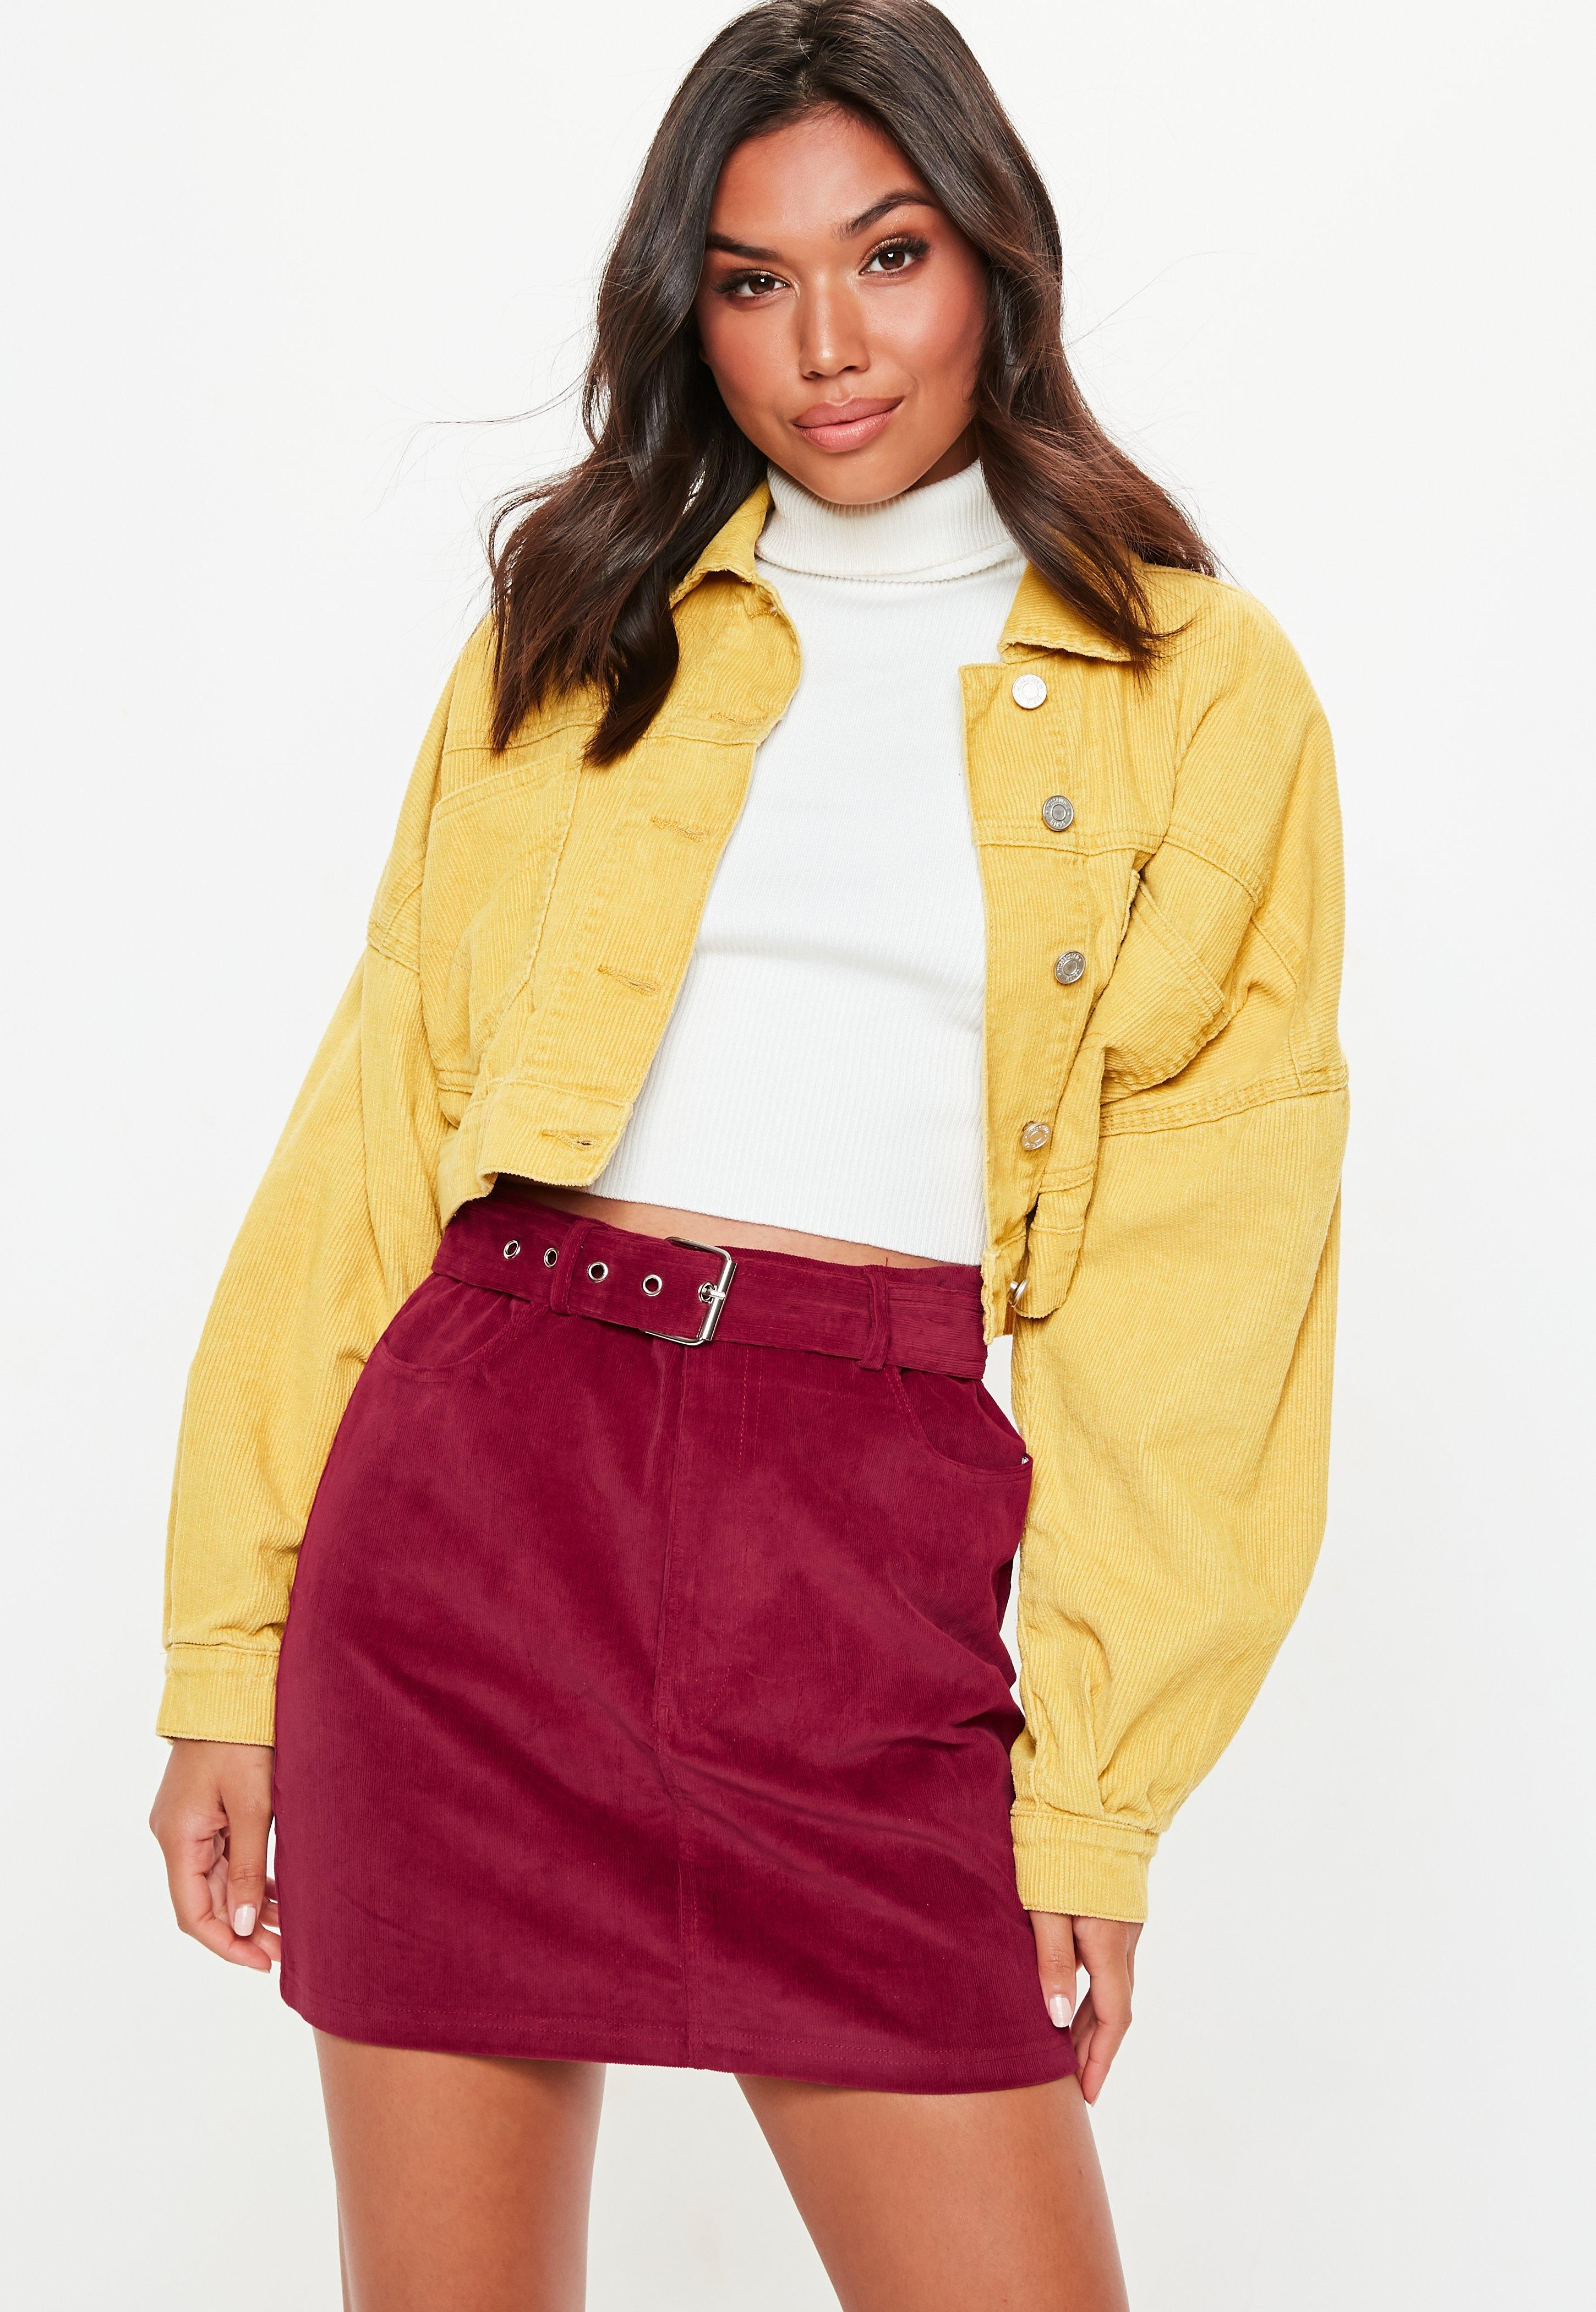 aa7ac42e6e5c Missguided - Multicolor Burgundy Corduroy Buckle Detail Mini Skirt - Lyst.  View fullscreen